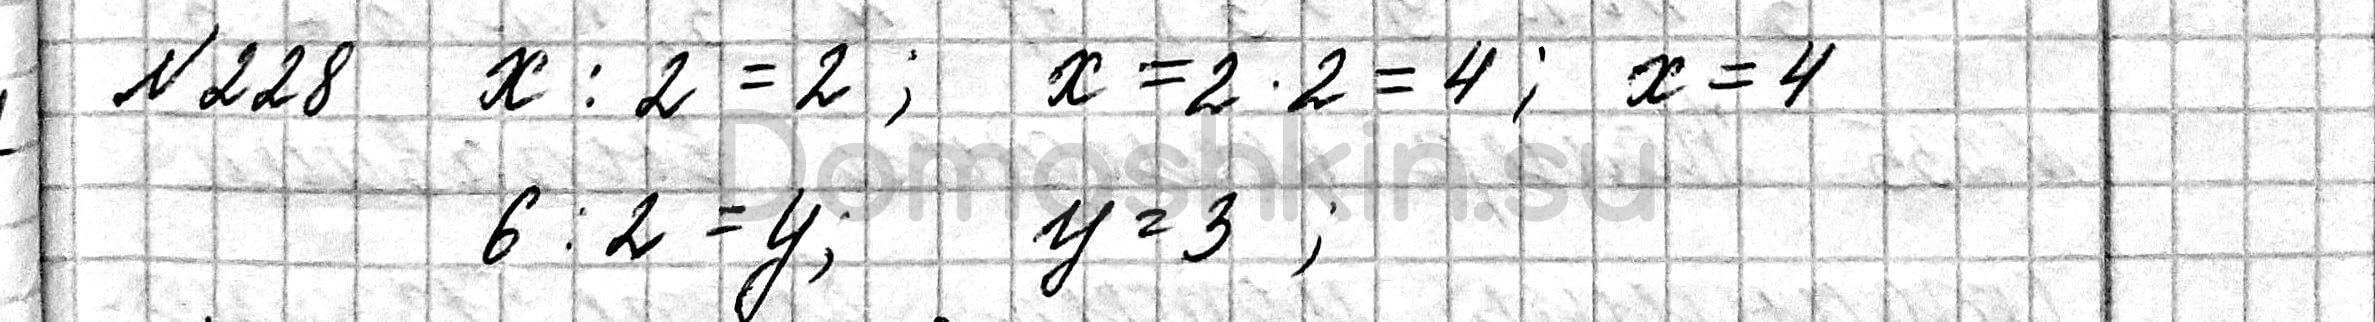 Математика 6 класс учебник Мерзляк номер 228 решение